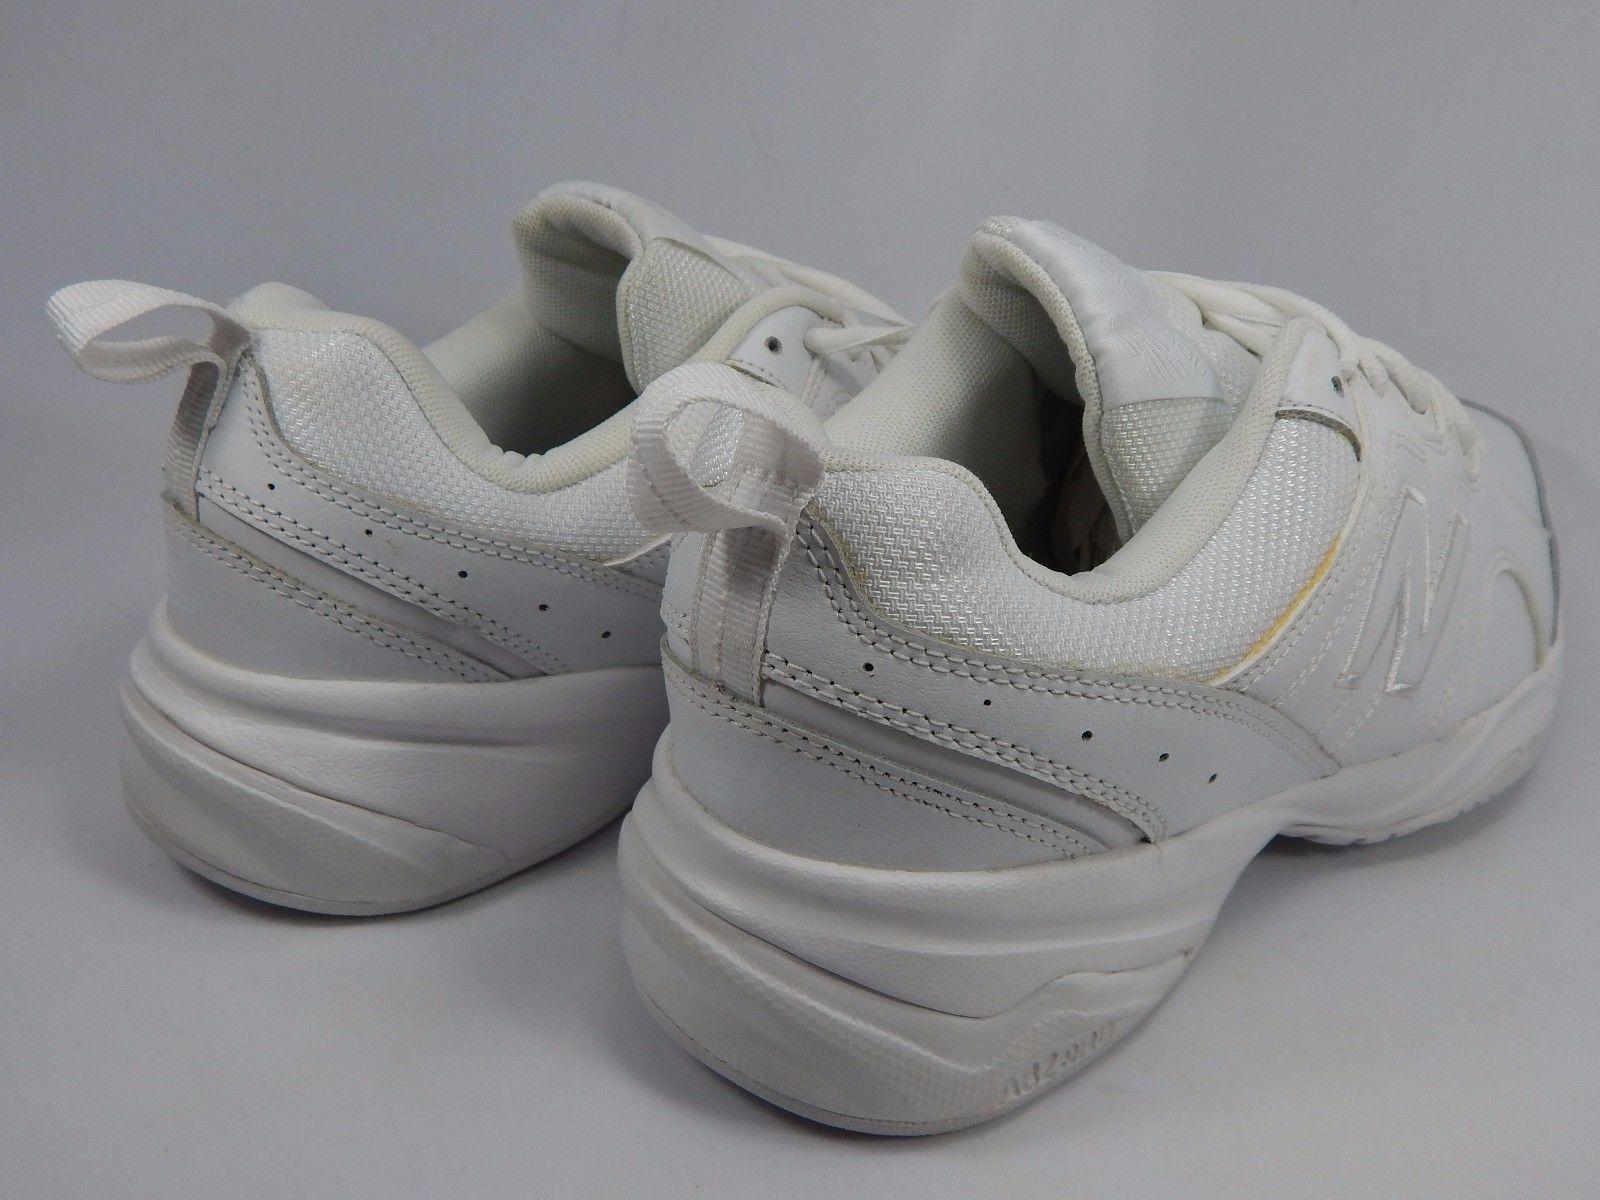 New Balance 609 v3 Mens Training Shoes Size 10.5 M (D) EU 44.5 White MX609AX3